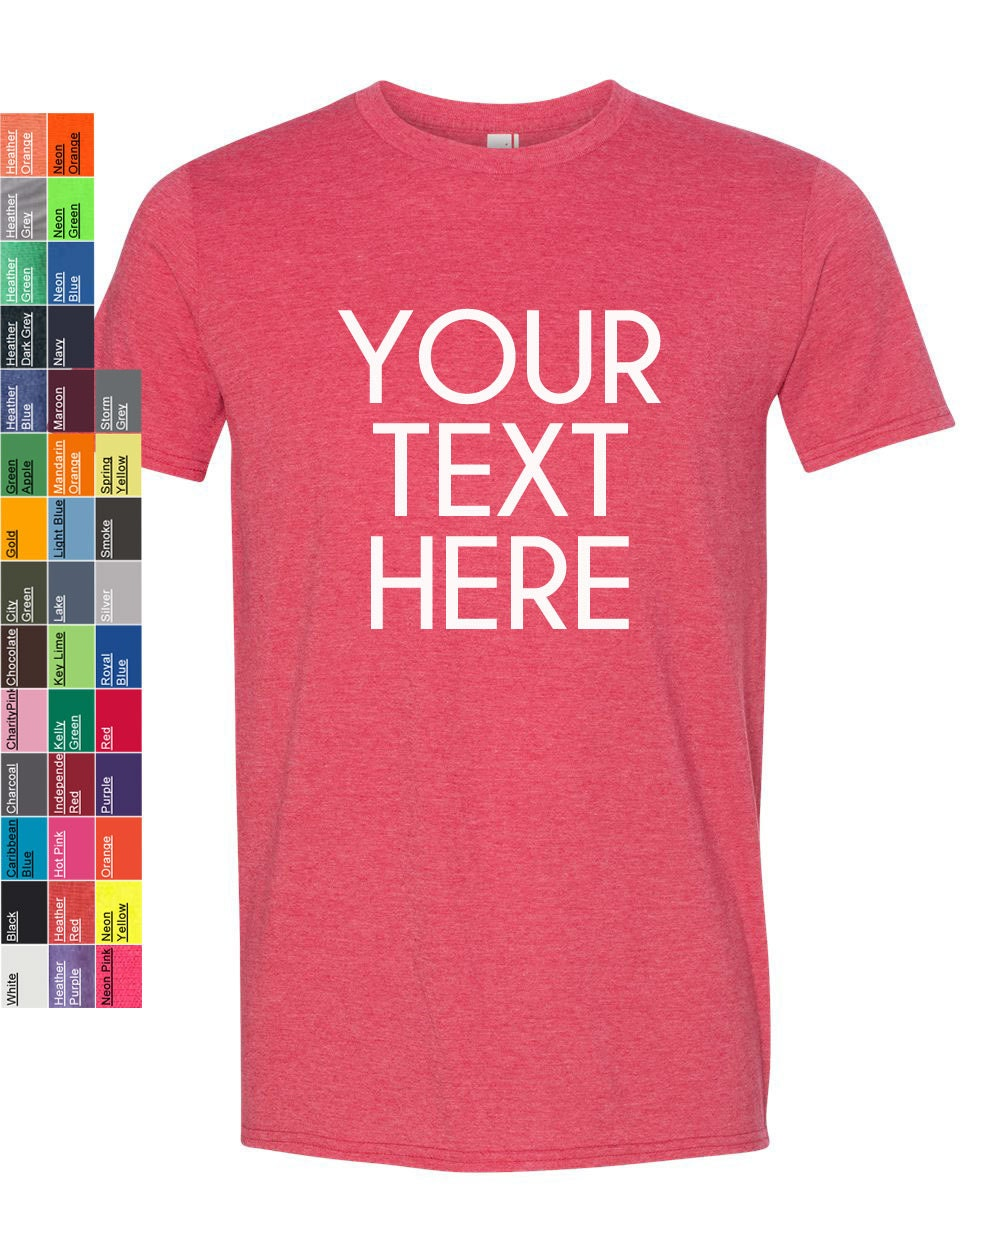 Custom Made Anvil Lightweight Fashion Short Sleeve T Shirt 980 Vinyl Or Glitter Print Customized All Colors